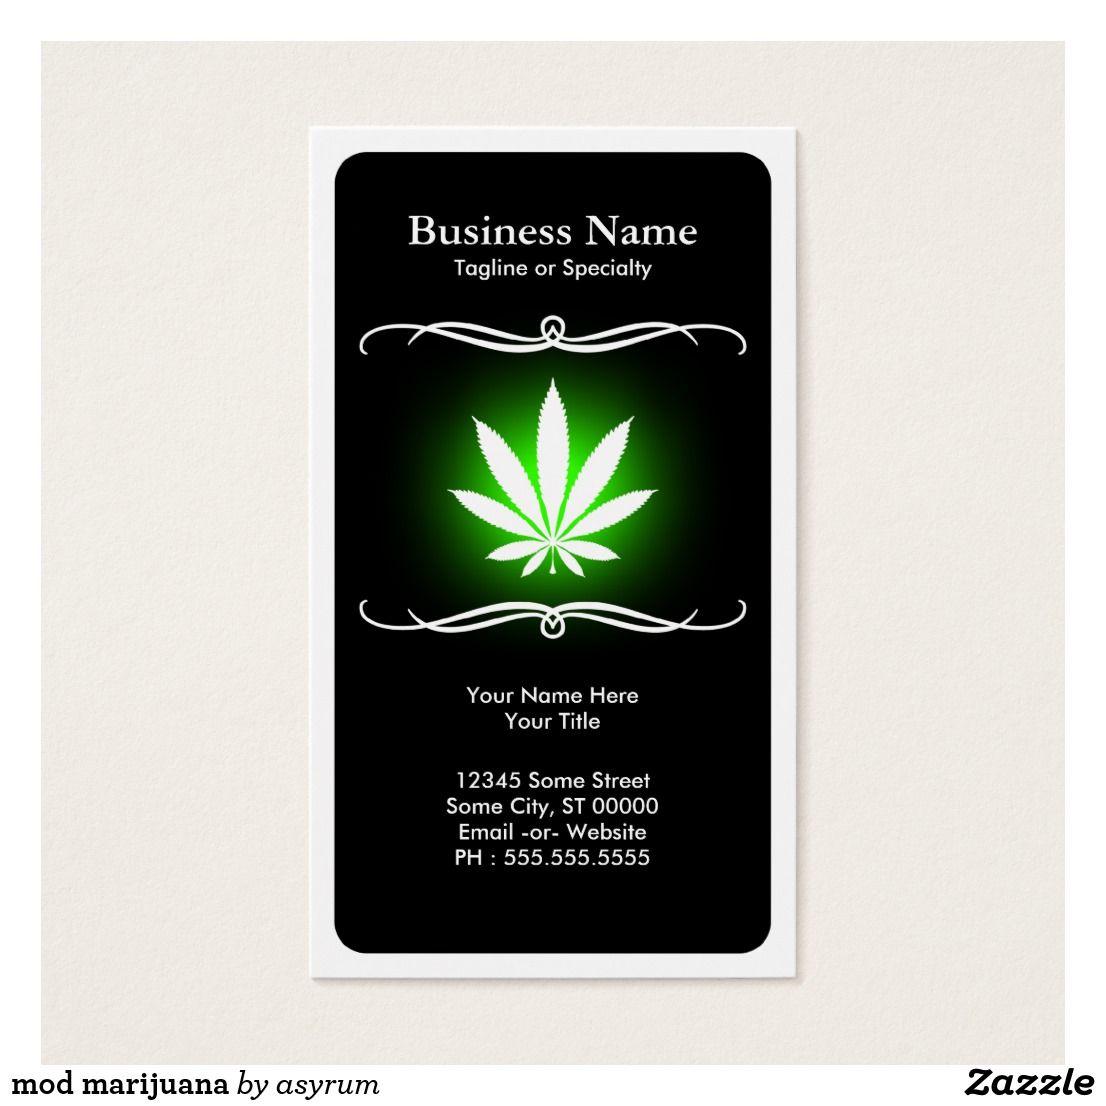 Mod marijuana business card | Business cards and Business